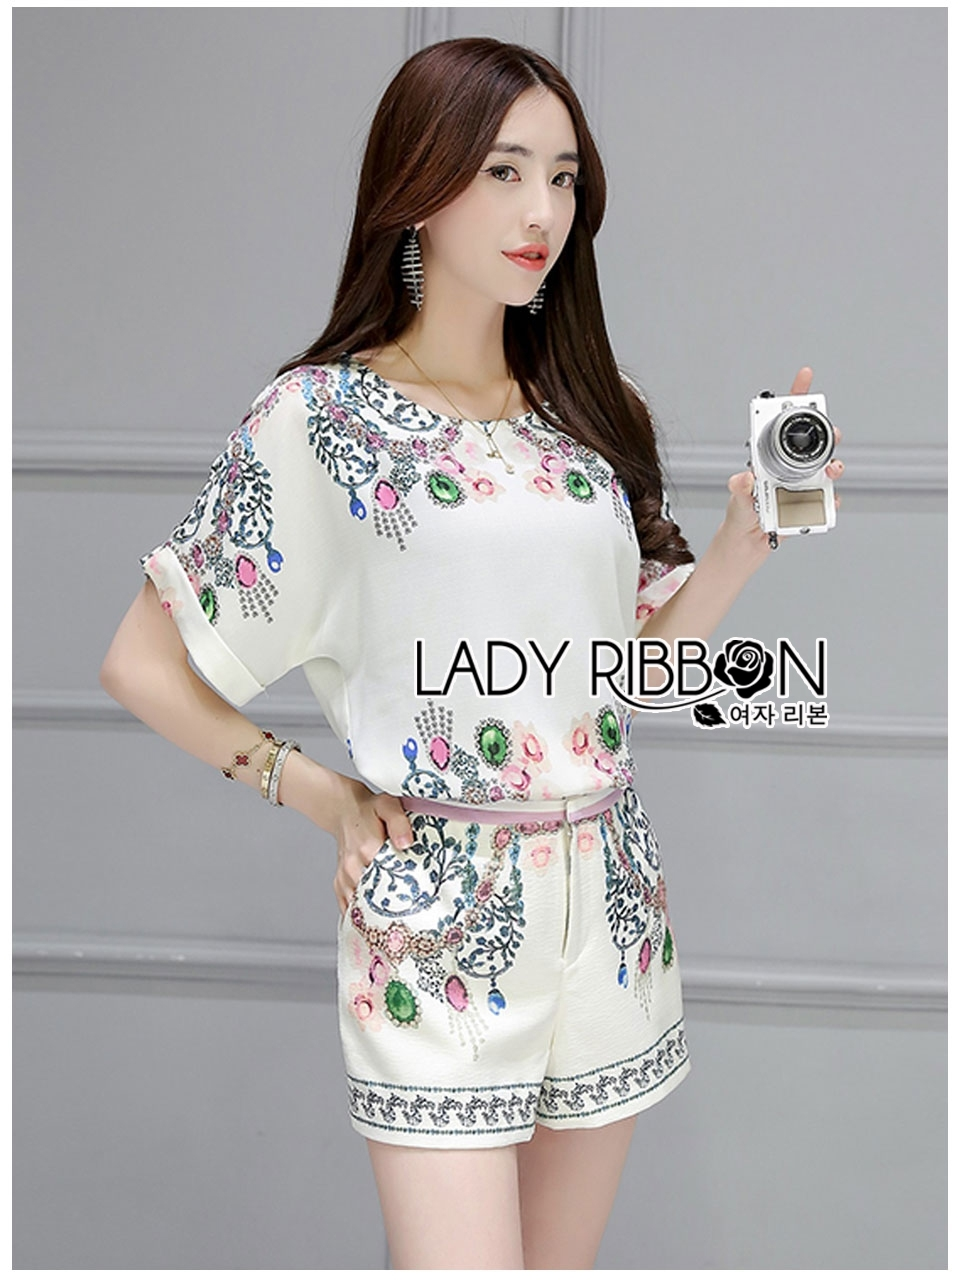 Lady Ribbon's Made Lady Sarah Pretty Bejewelled Printed Set